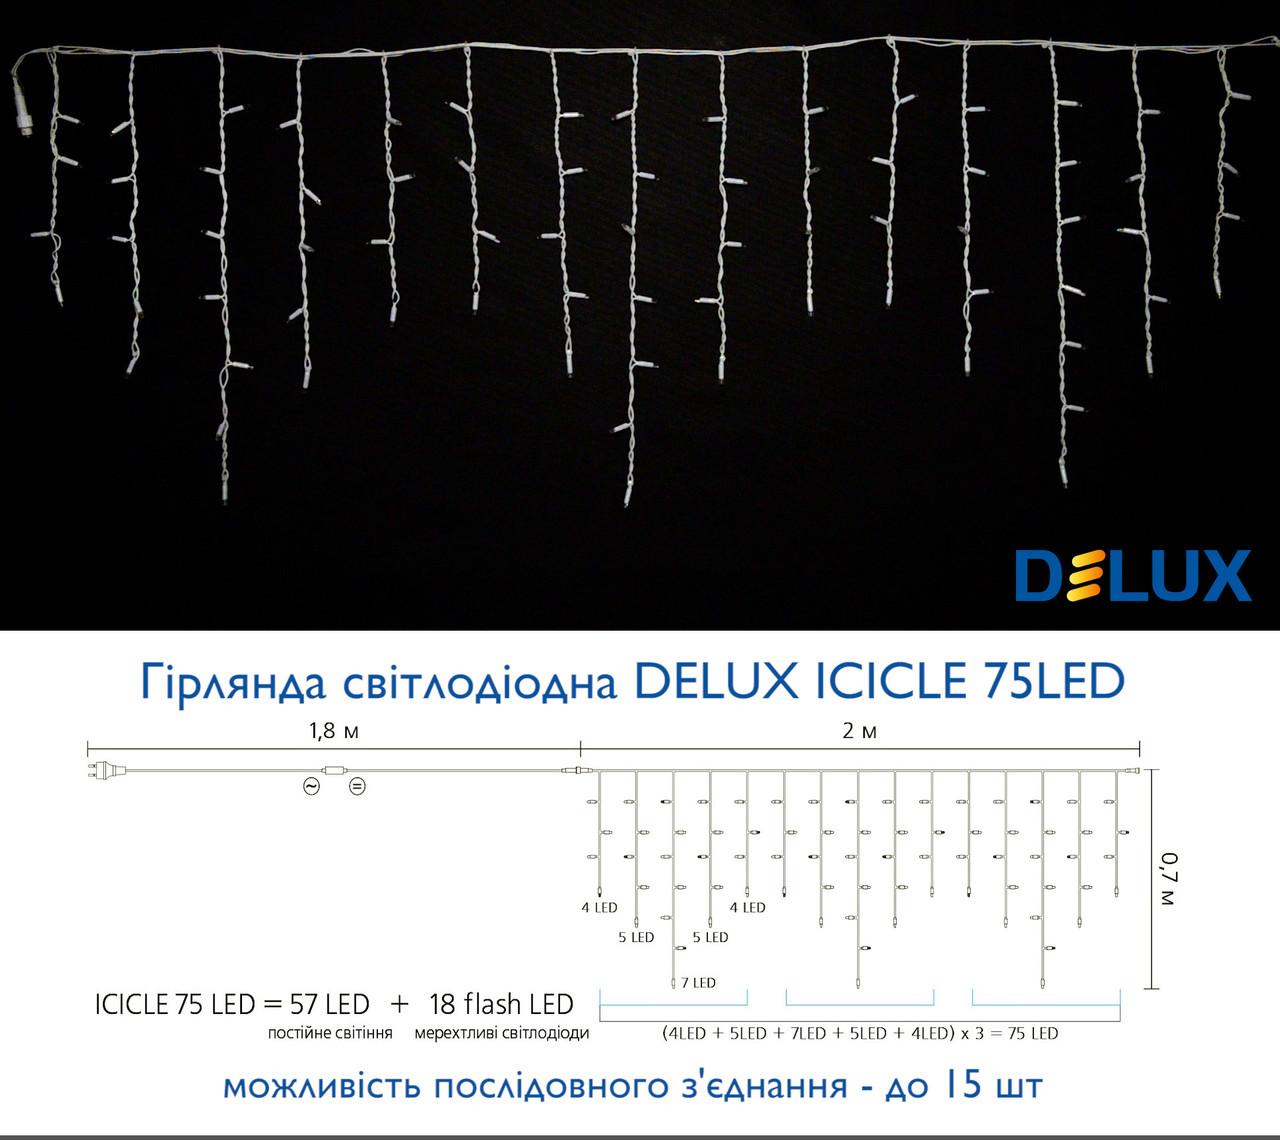 Гирлянда уличная DELUX ICICLE 75LED 2x0.7m 18 бел flash тепл.бел/бел IP44 EN